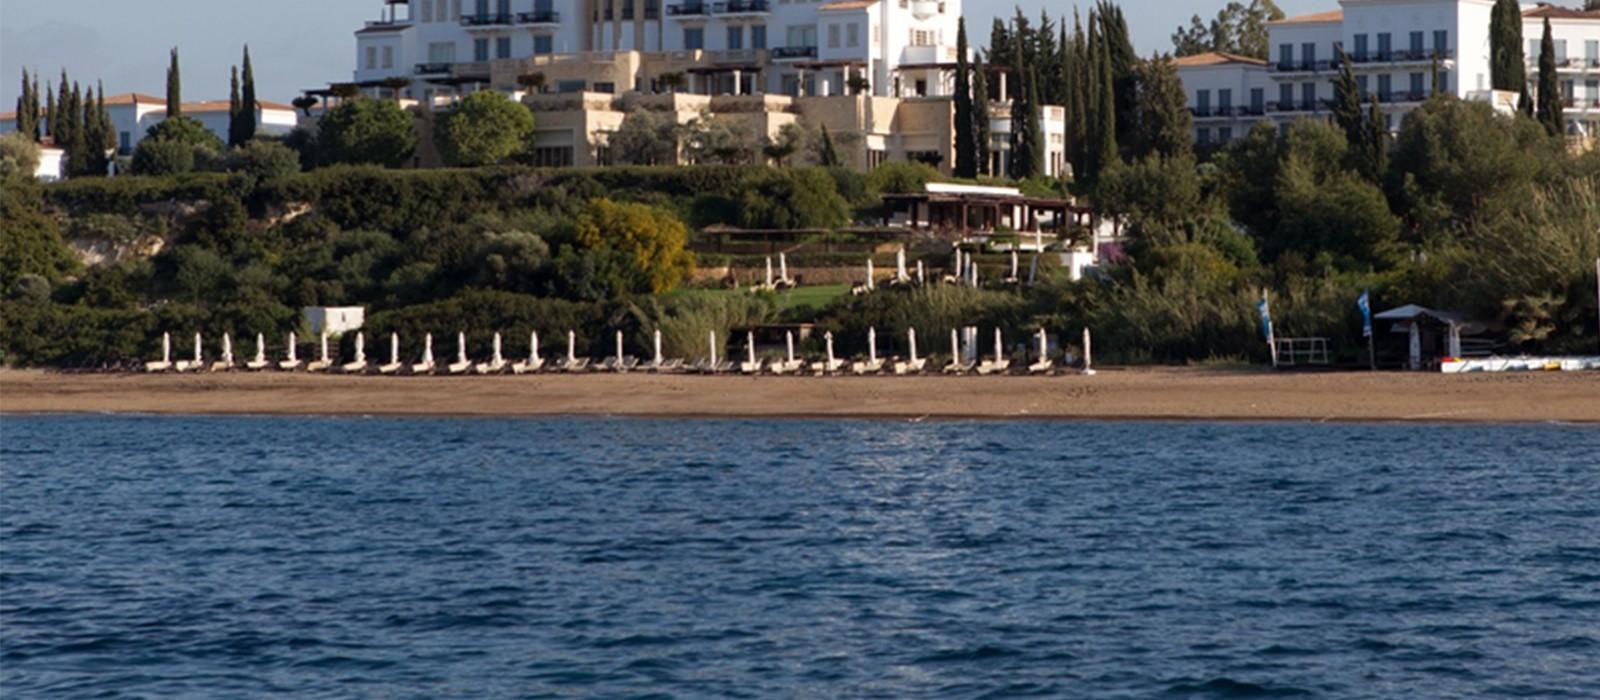 Header - Anabelle Cyprus - Luxury Cyprus Holidays